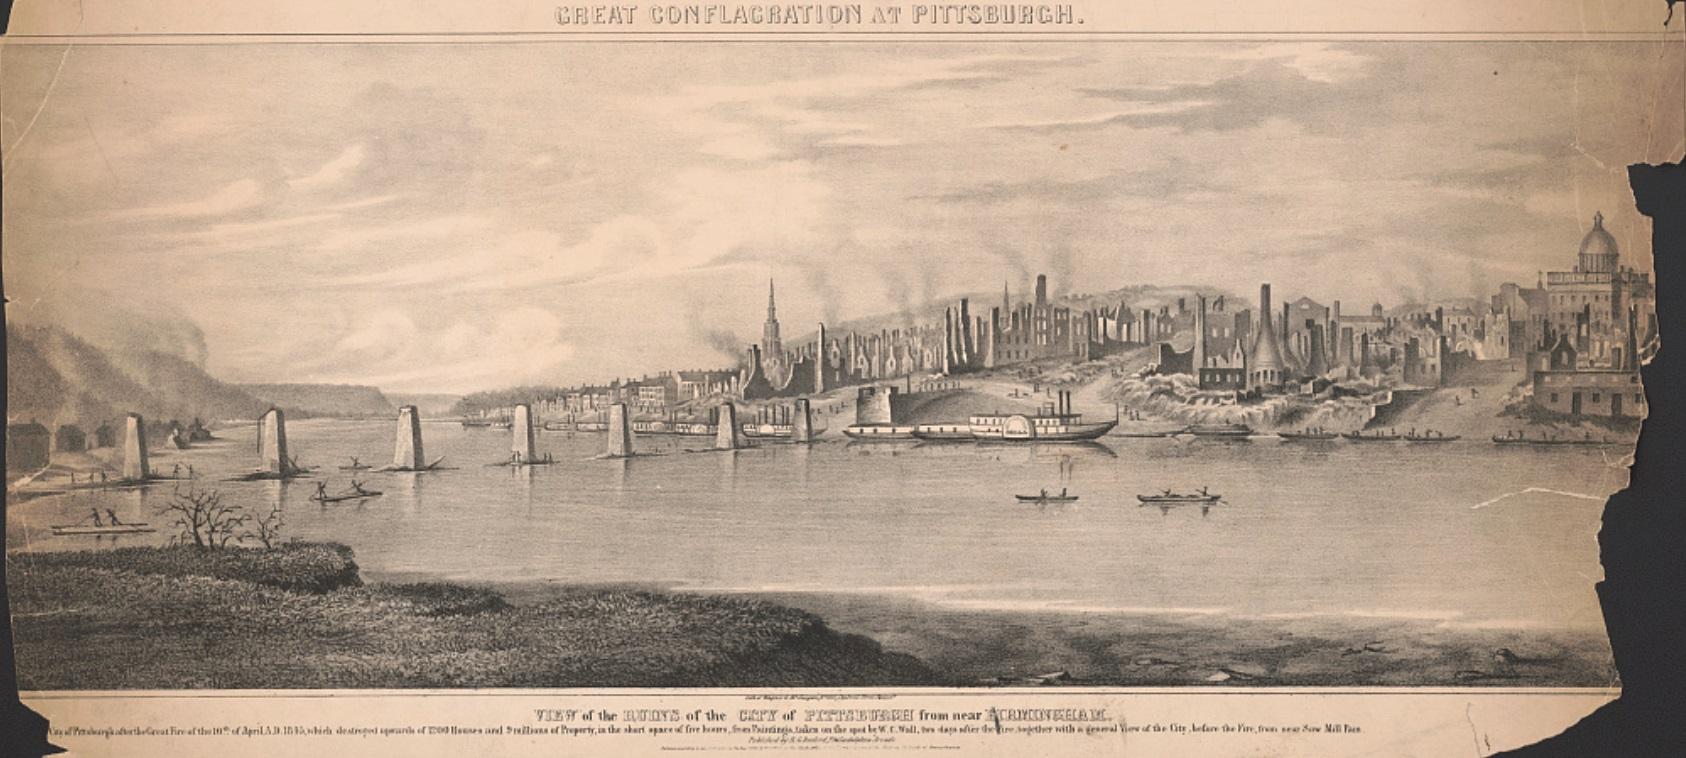 1845-pittsburgh-aftermath-2.jpg